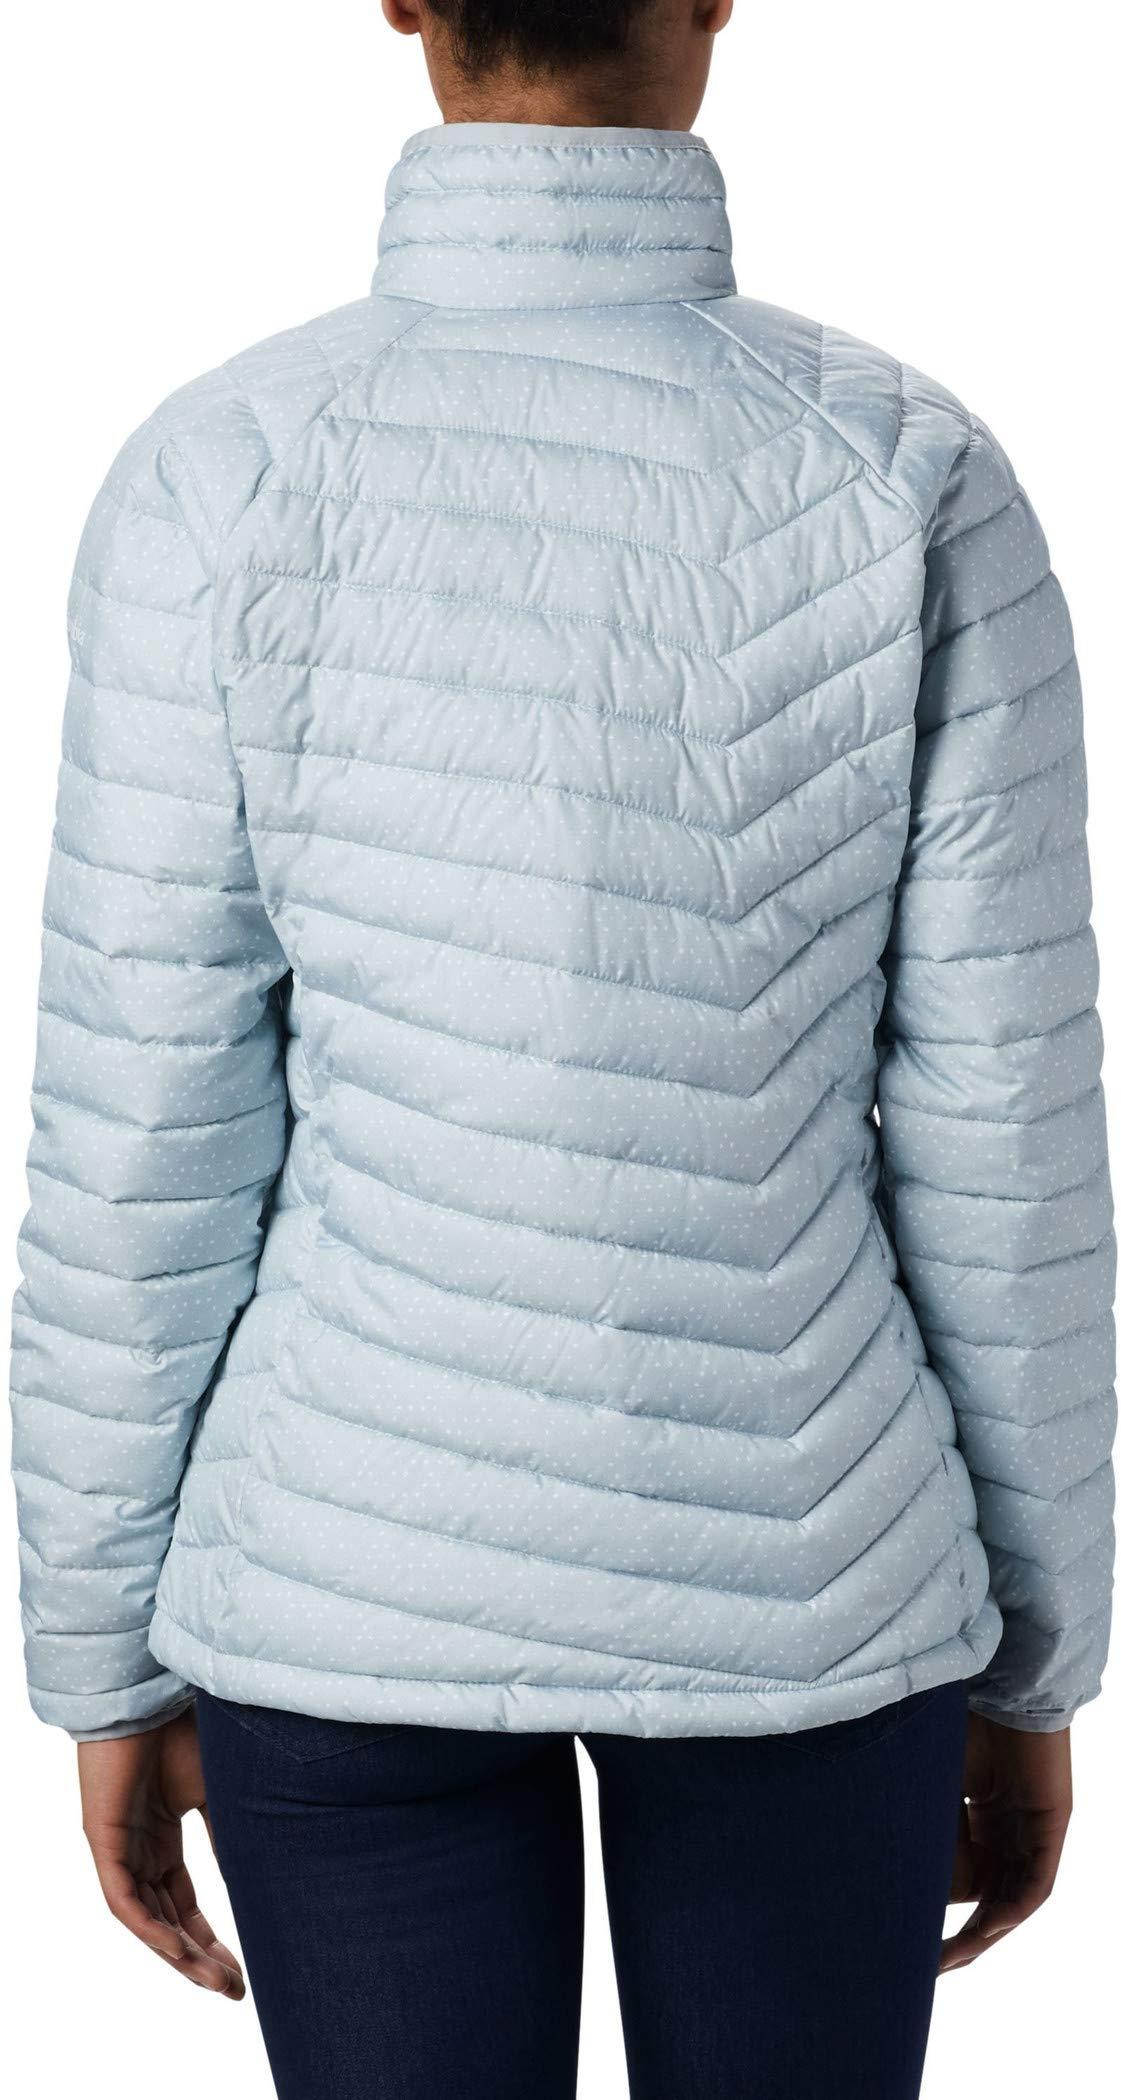 71VS6x 68kL - Columbia Women's Powder Lite Jacket